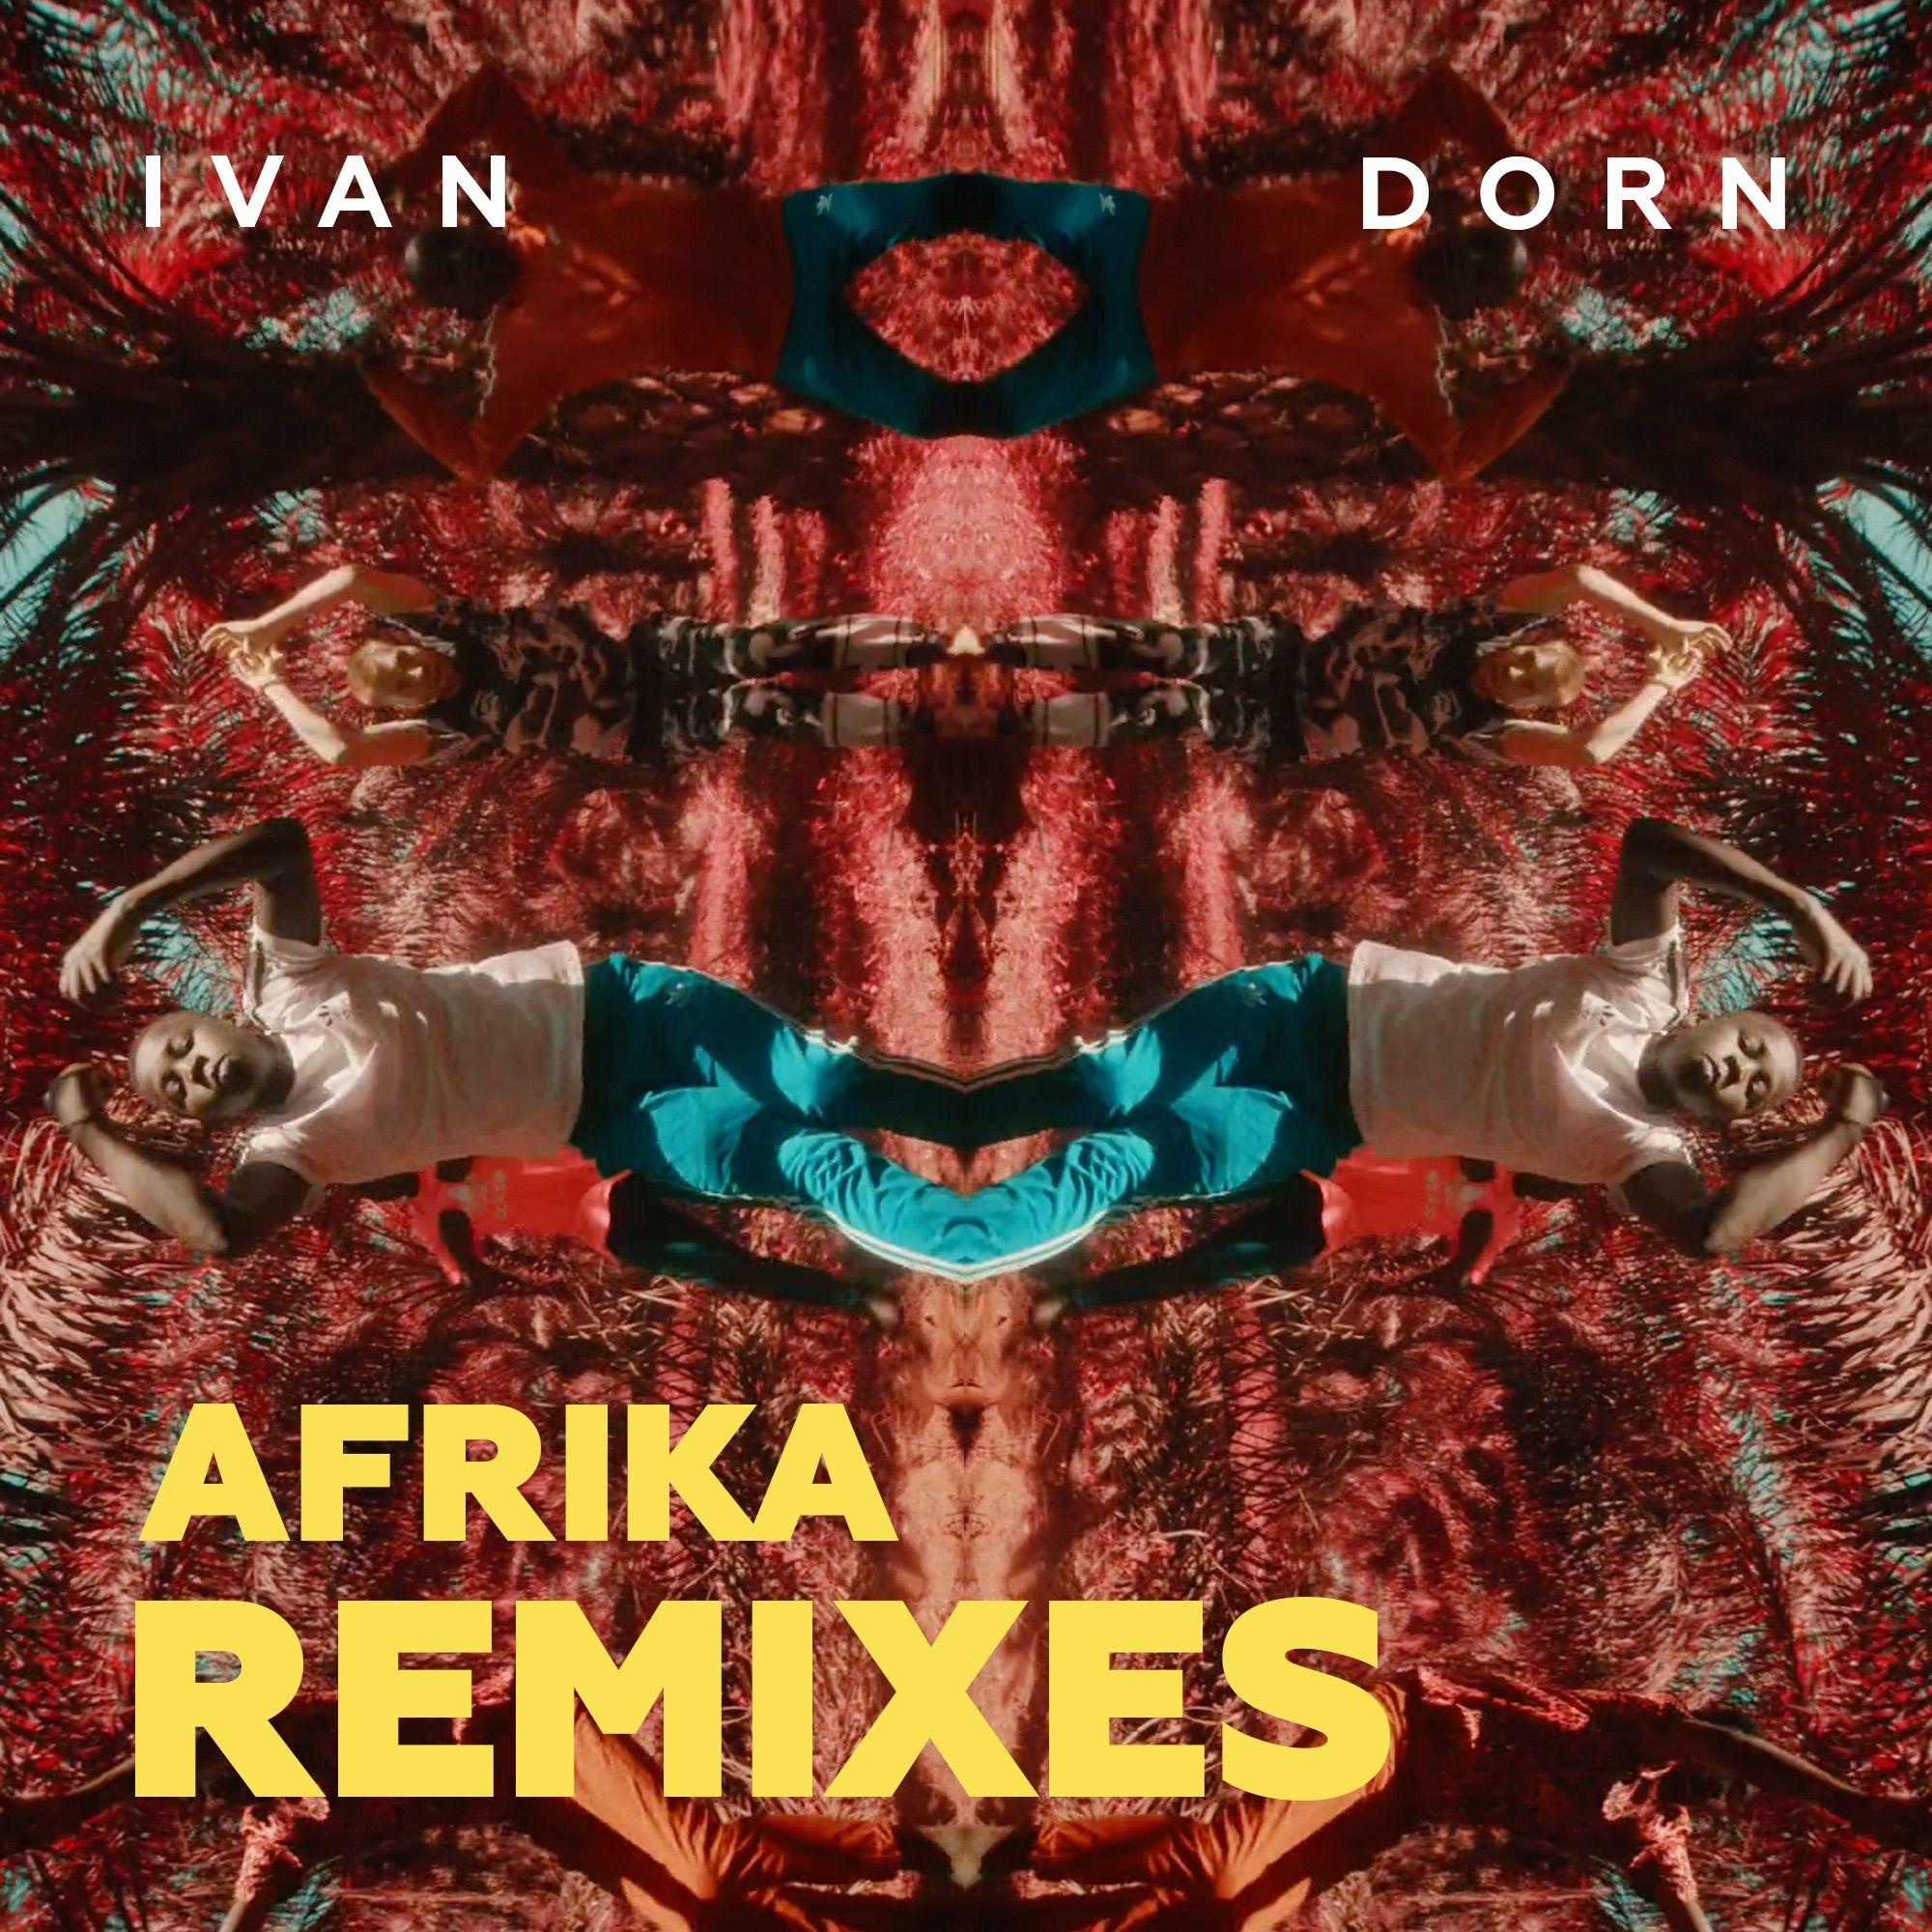 ivan_dorn_-_afrika_remixes.jpg